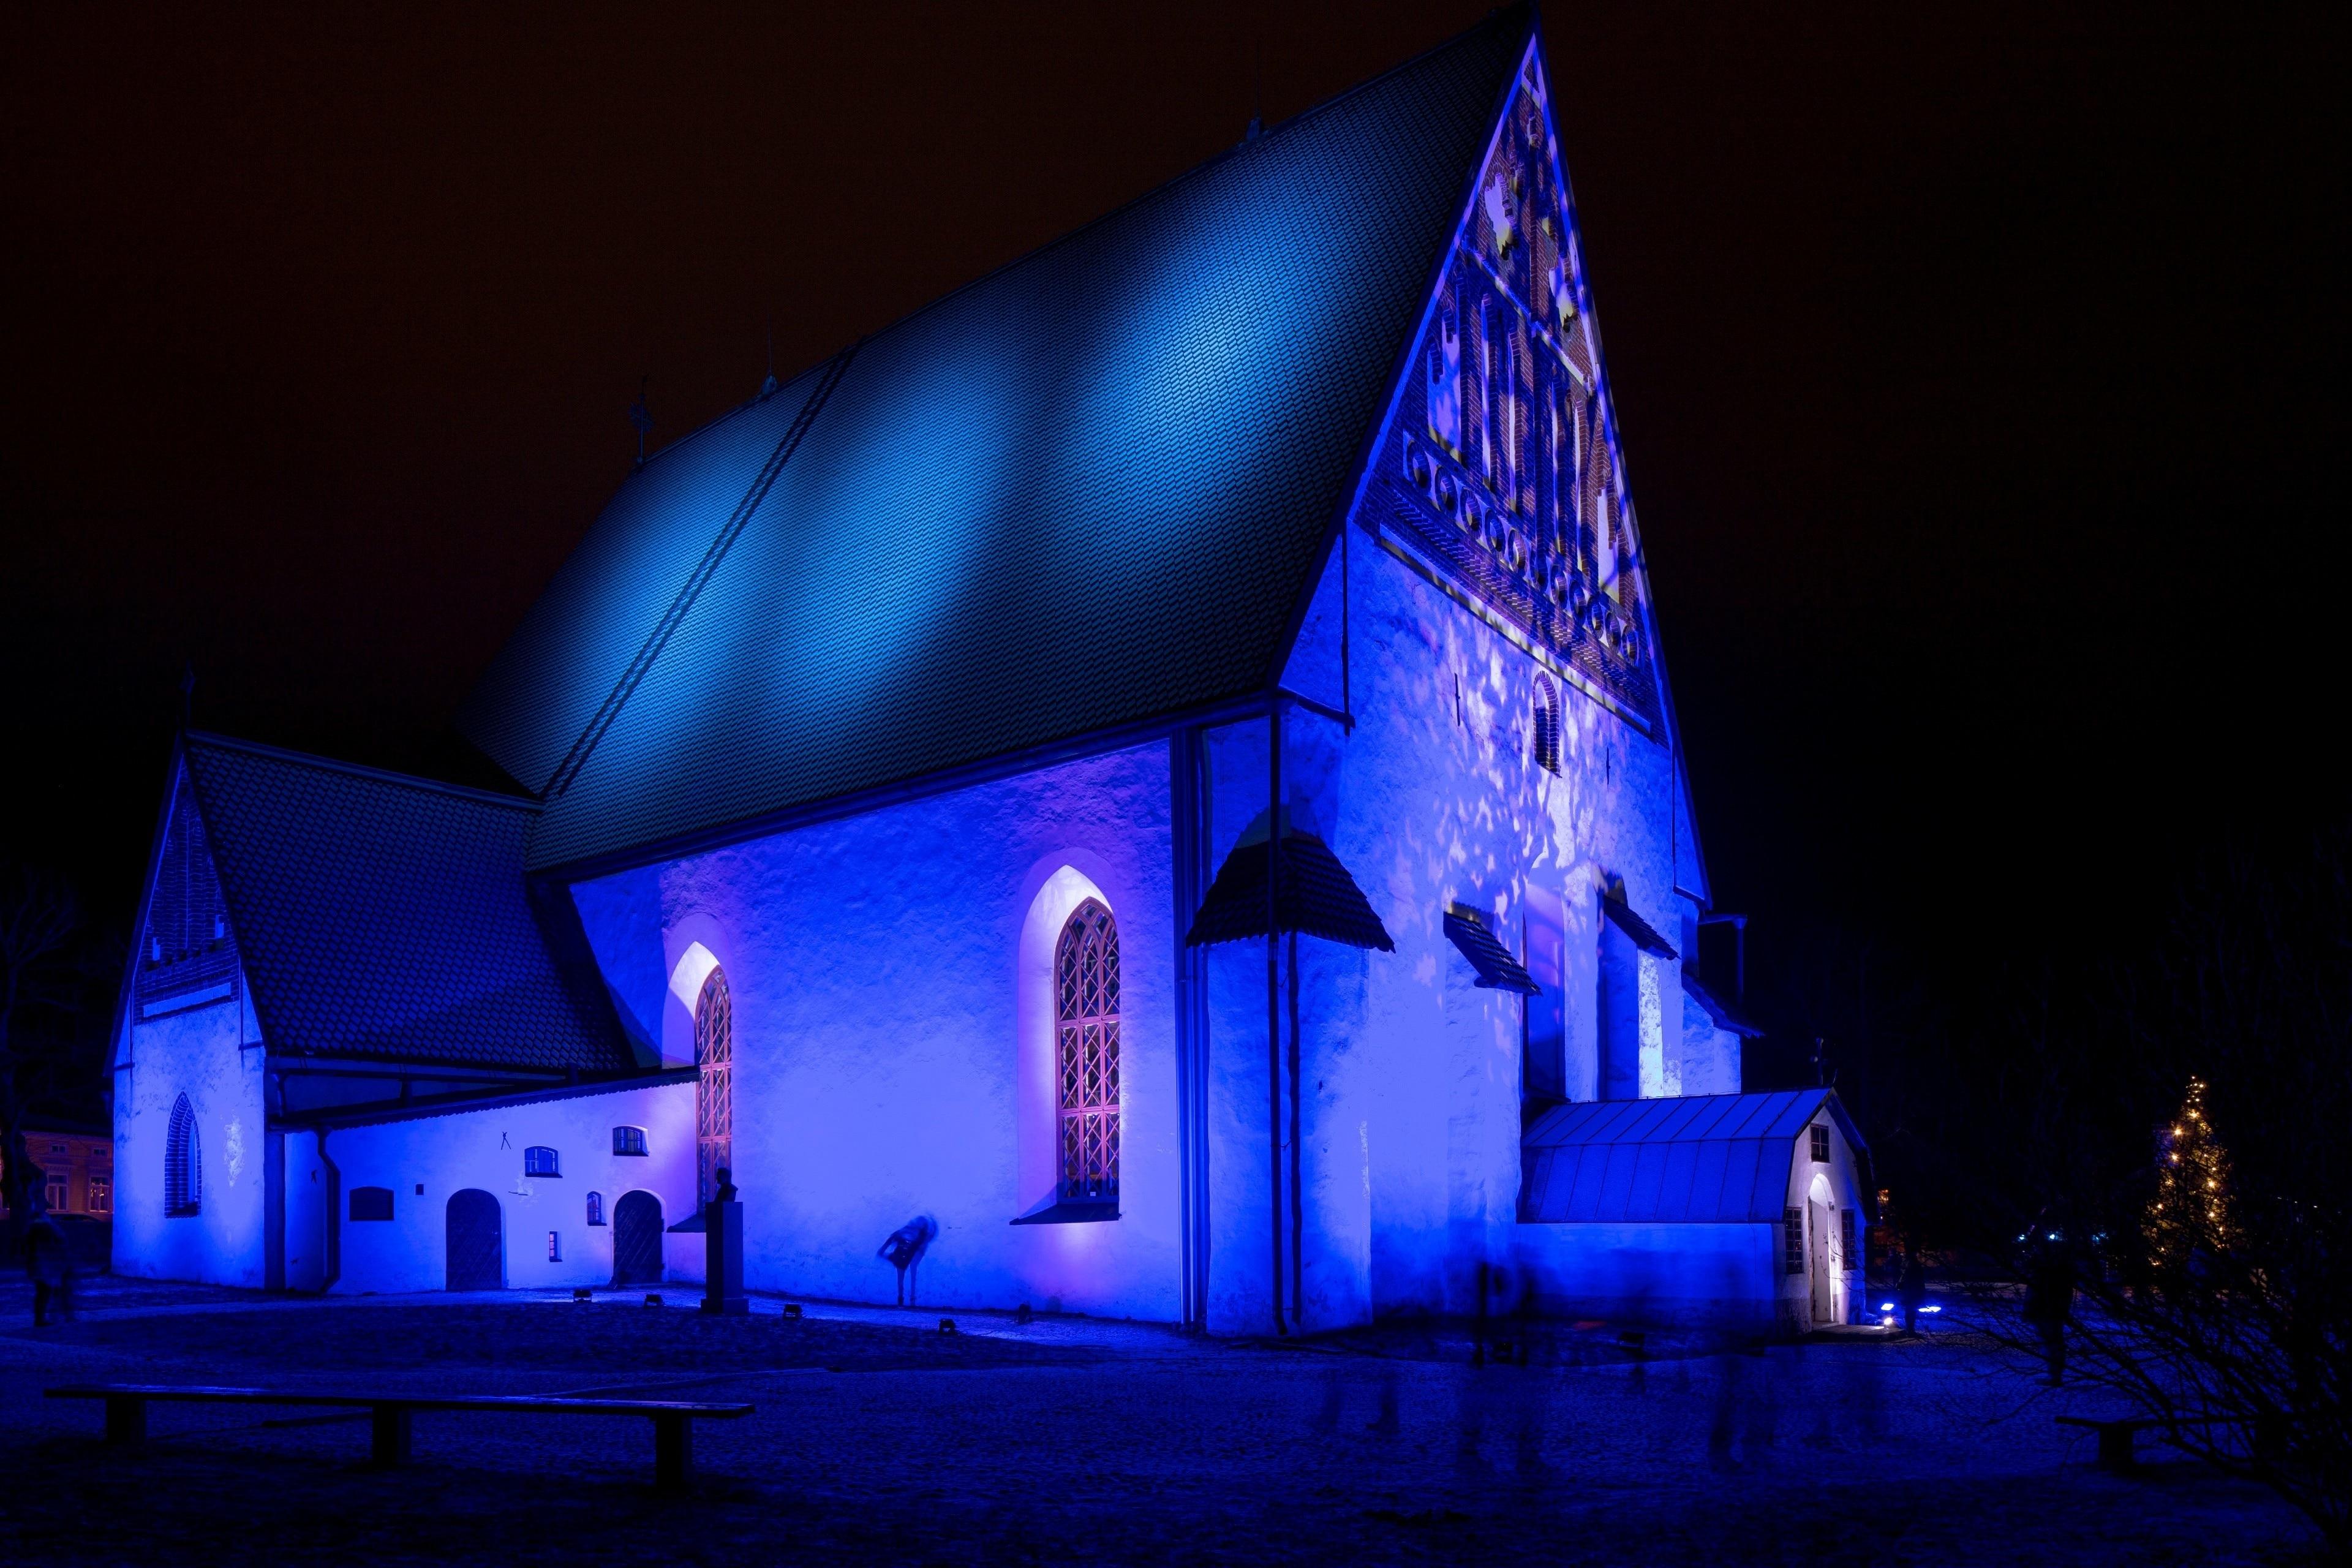 Porvoo Cathedral, Porvoo, Uusimaa, Finland